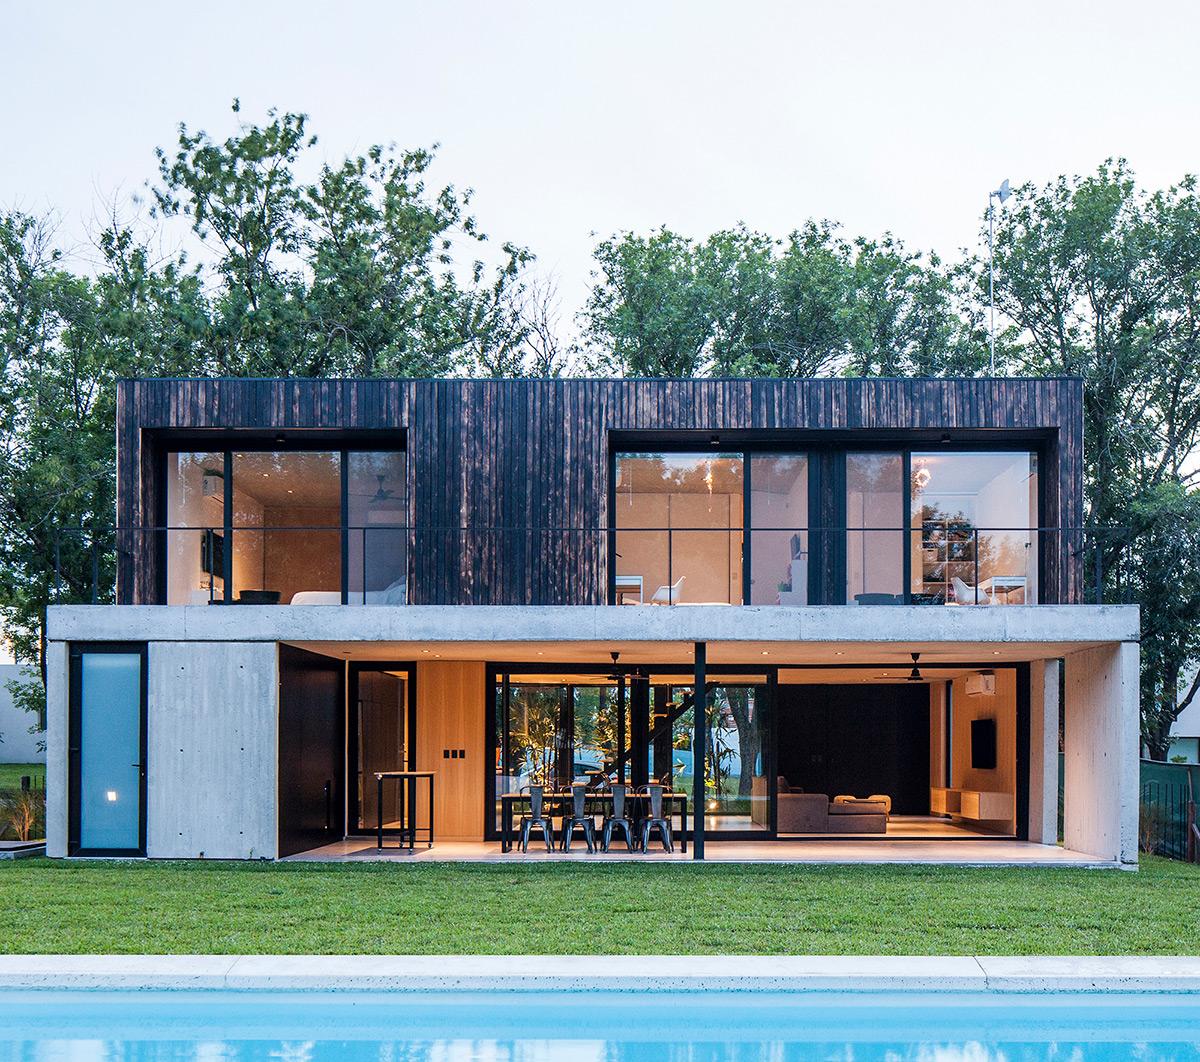 Casa-Negra-V2-Arquitectos-Alejandro-Peral-05